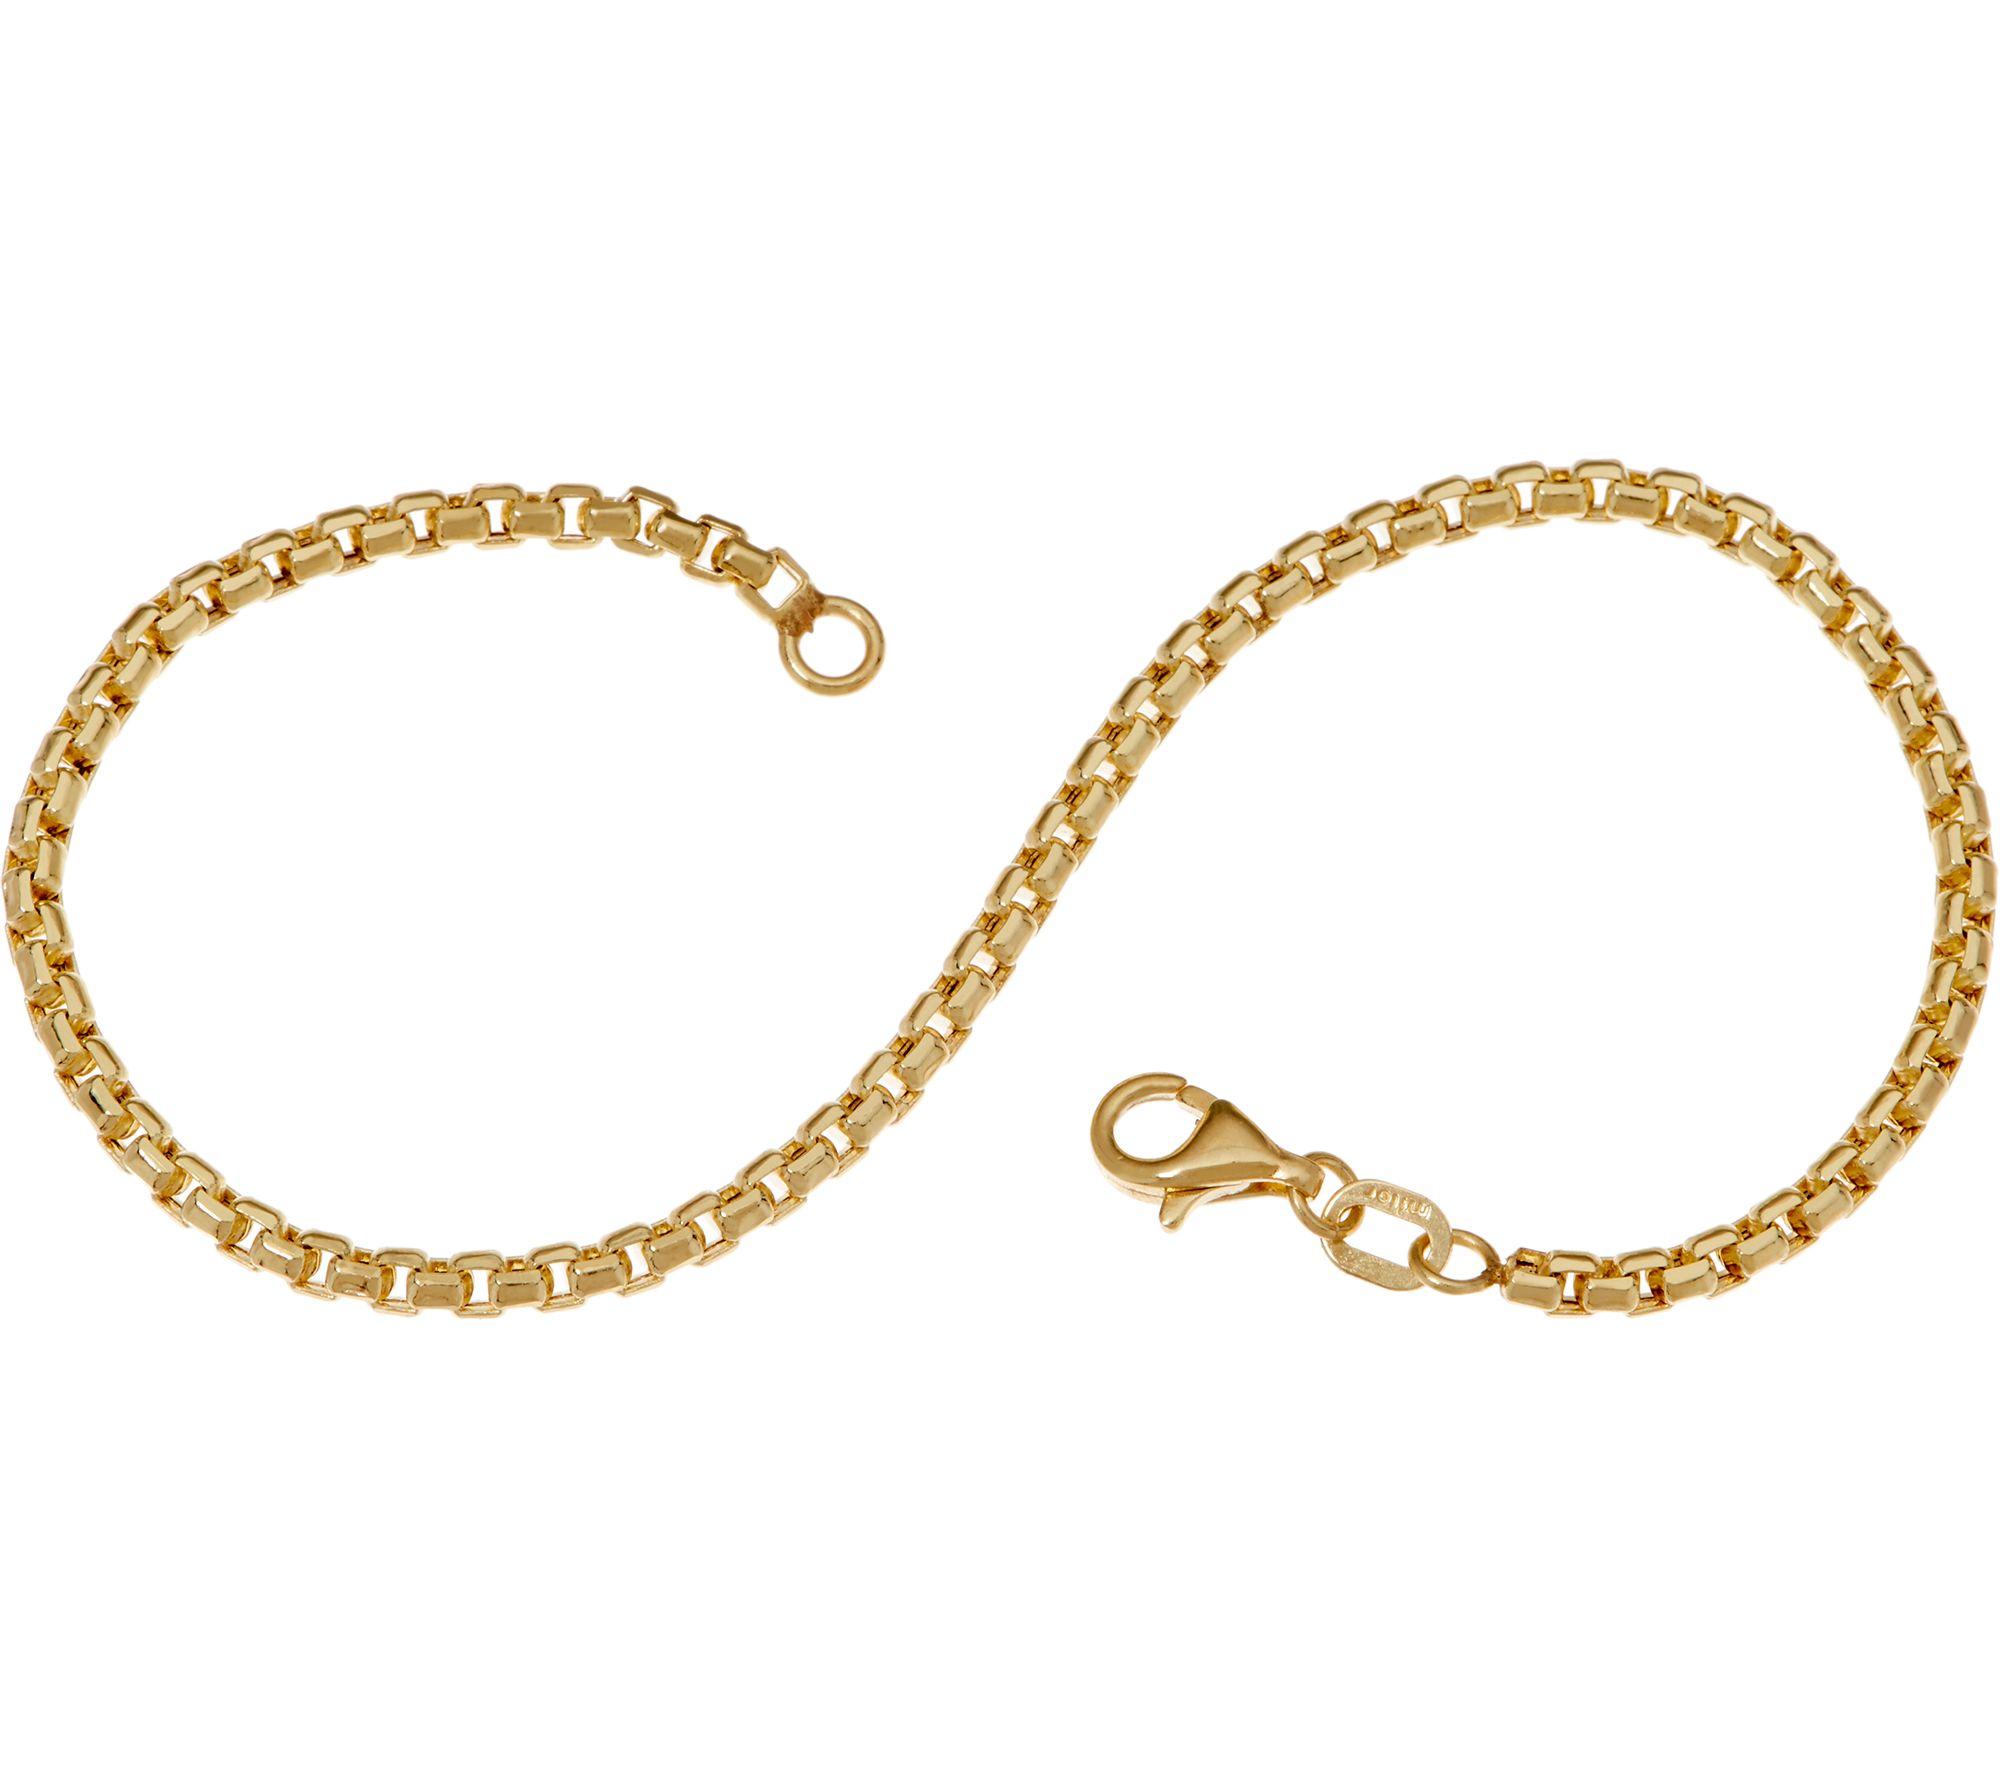 Italian Gold 6 3 4 Round Box Chain Bracelet 14k 2 1 Gr Qvc